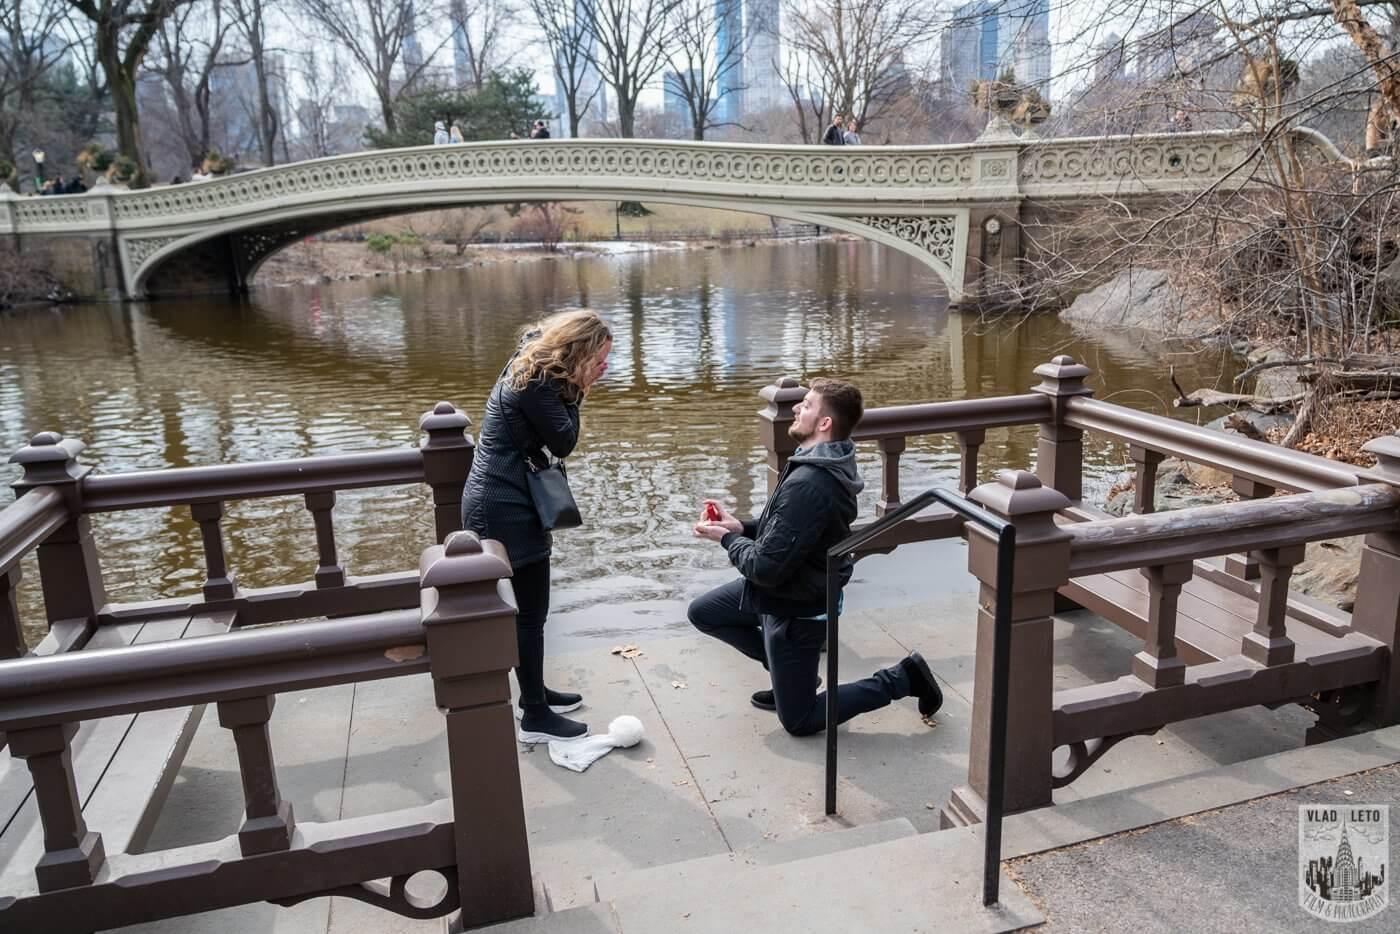 Photo Bow bridge wedding proposal in Central Park | VladLeto